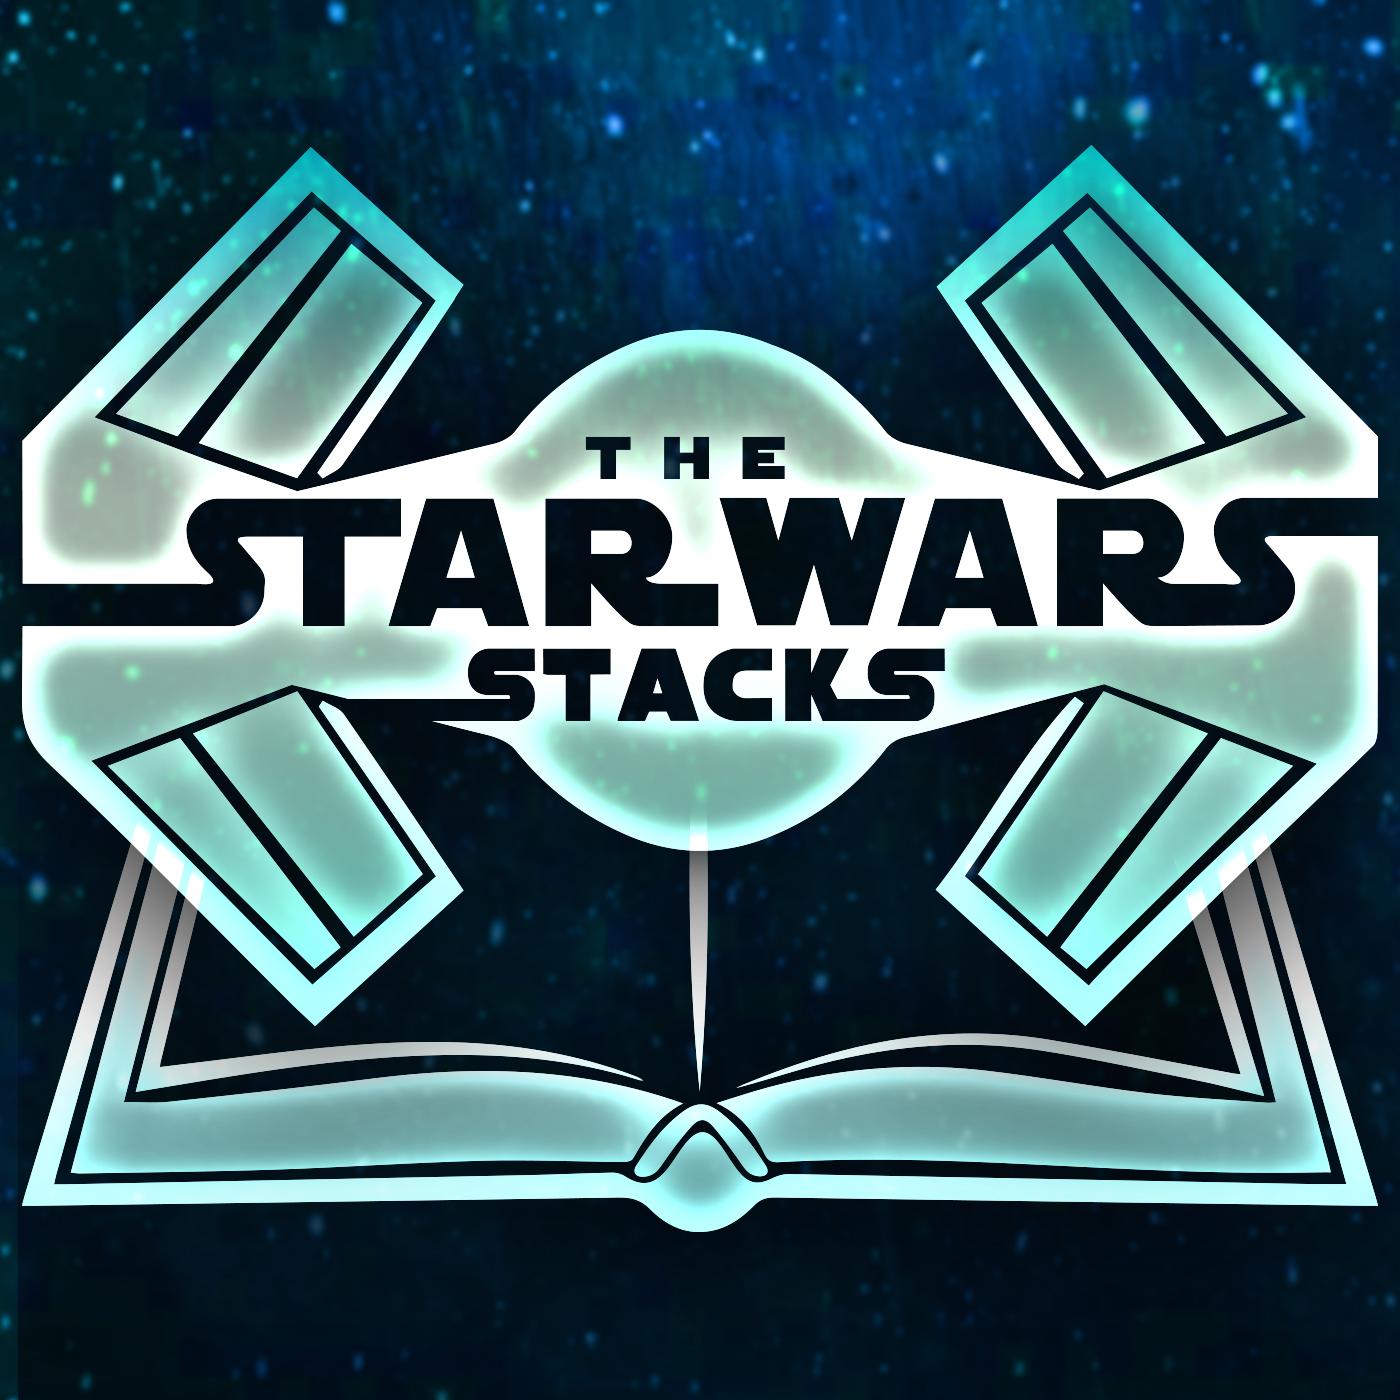 The Star Wars Stacks show art